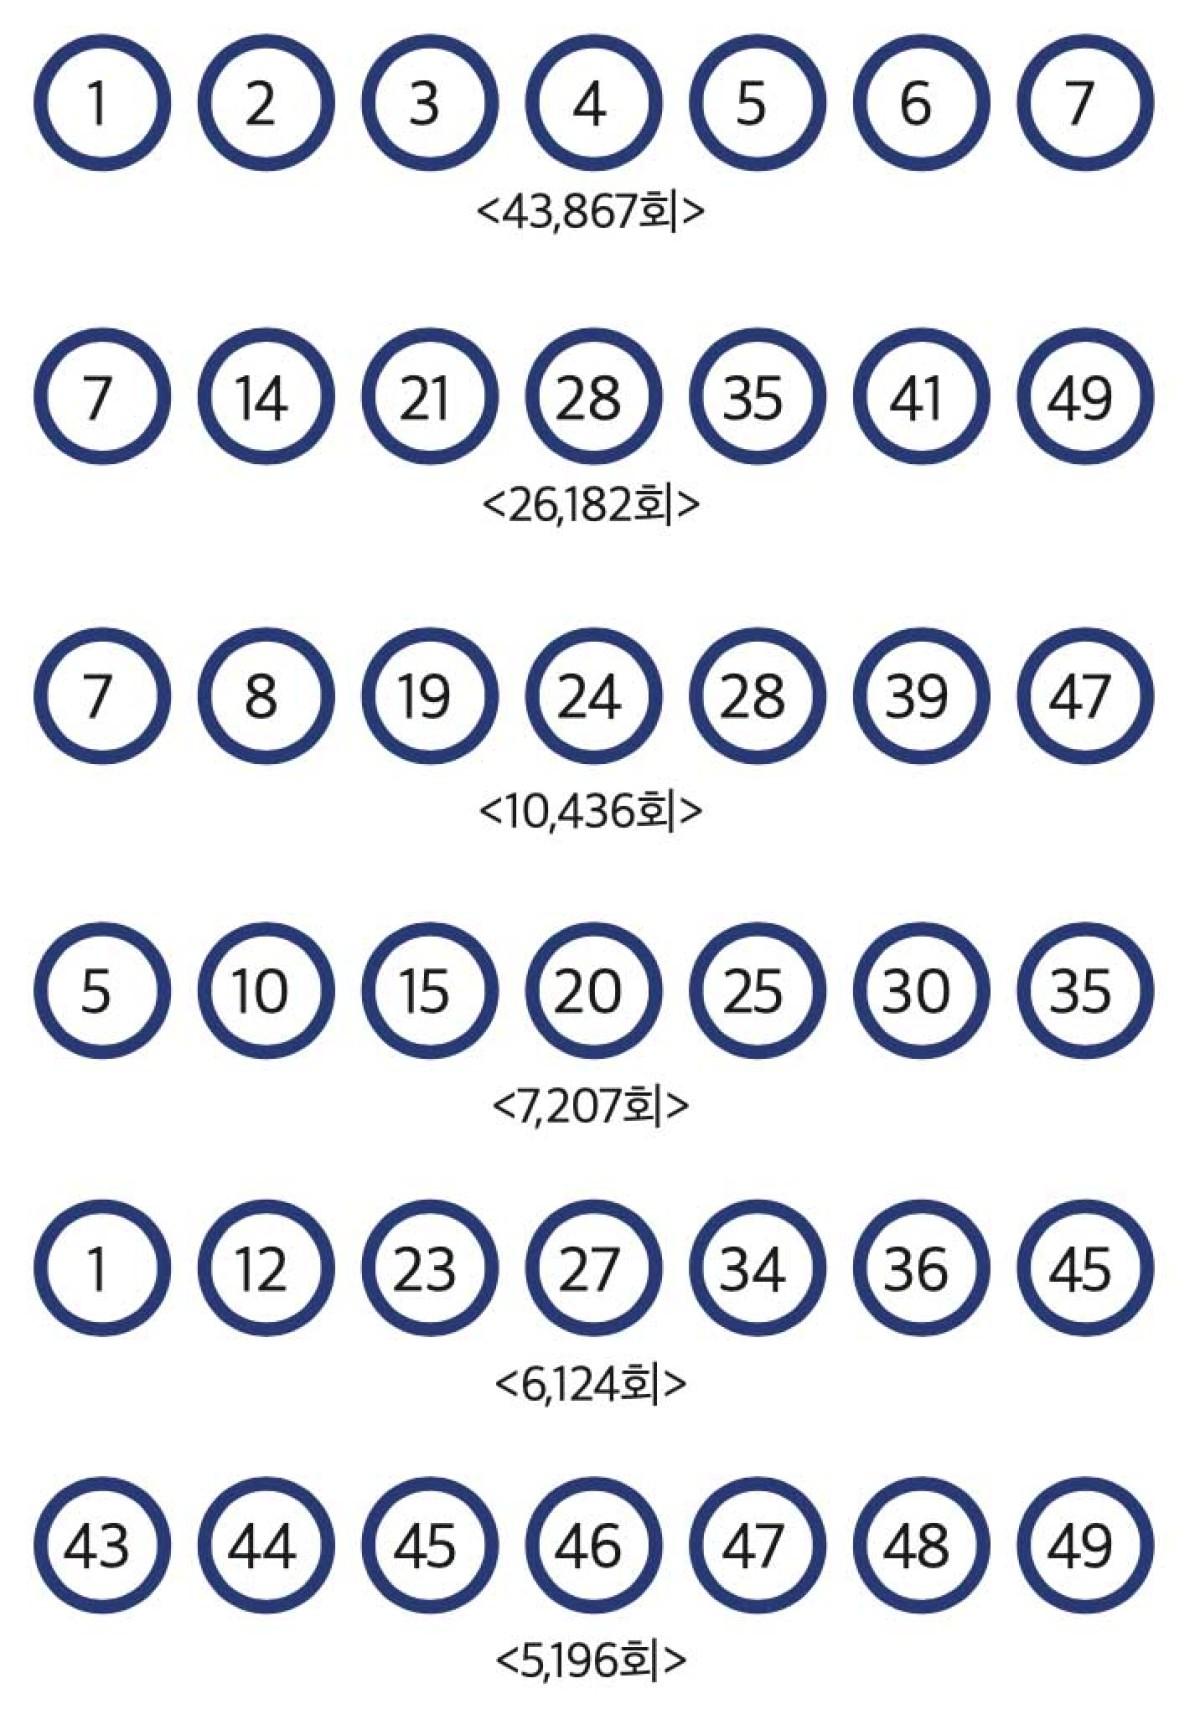 1676751459_CTv3Uq6m_695ab418cc80c9b1d7ad9212e2c9ff2c93e82a6b.jpg